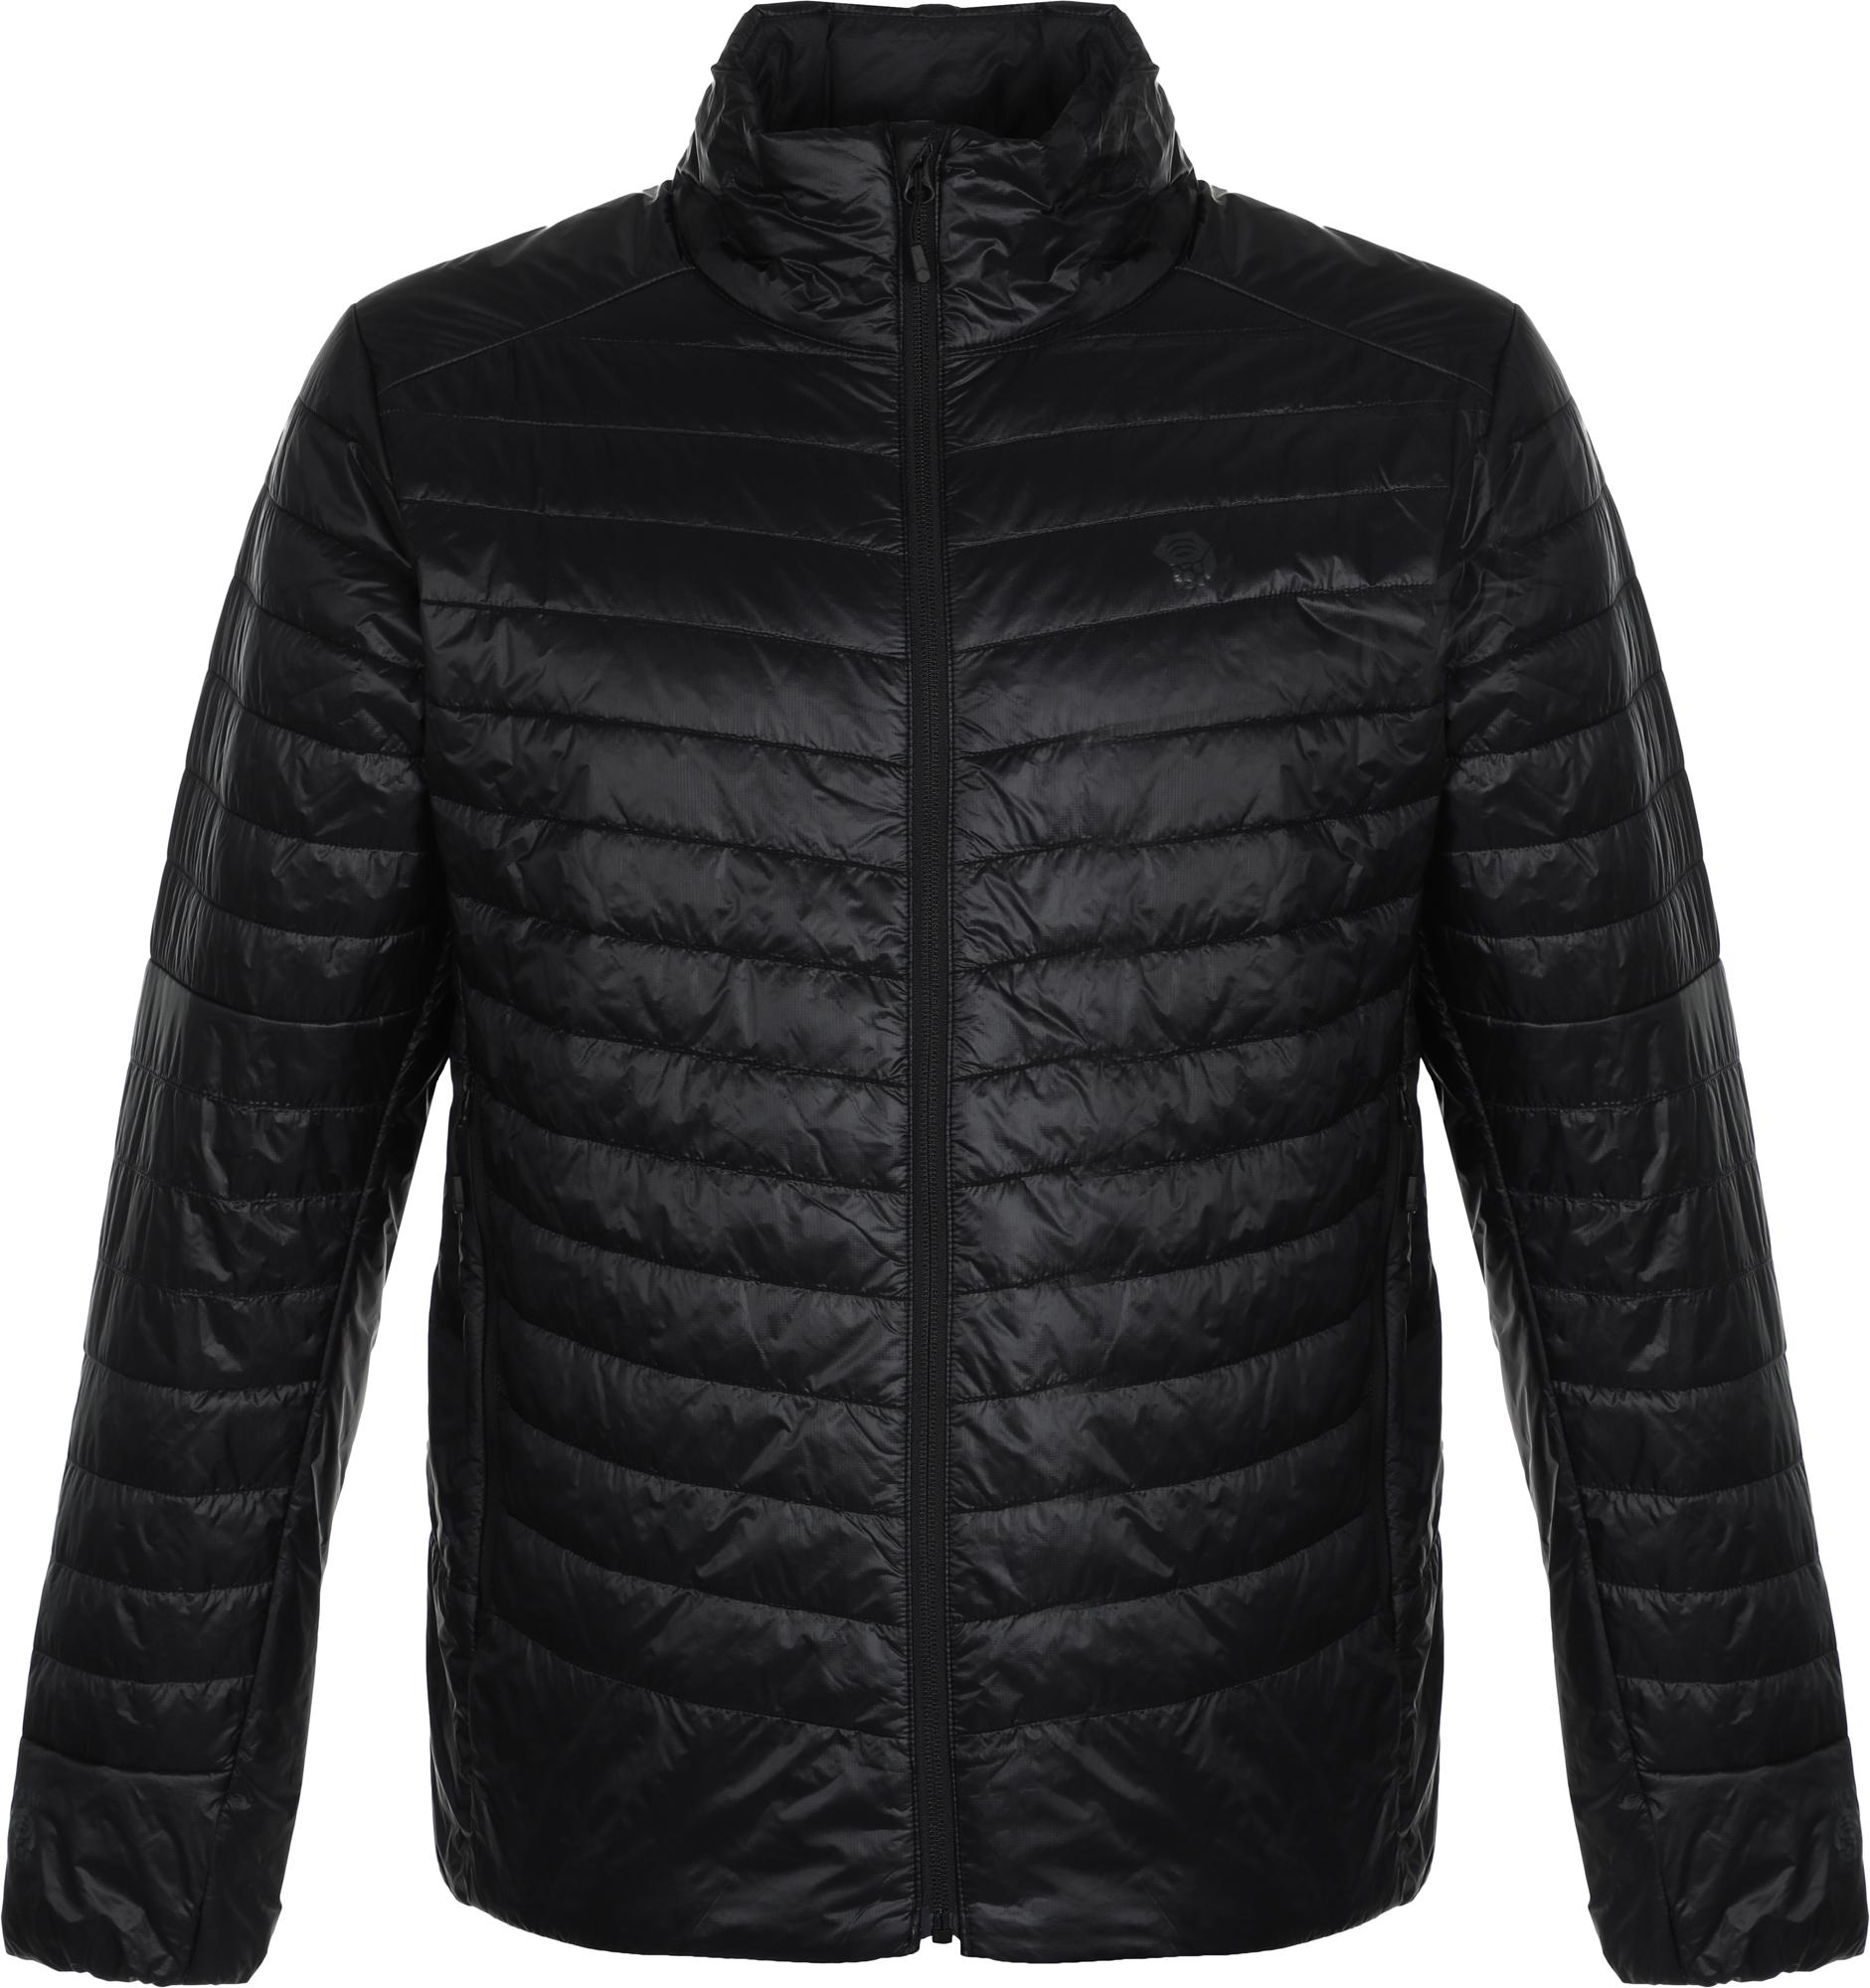 Mountain Hardwear Куртка утепленная мужская Mountain Hardwear Ghost Shadow™, размер 54 mountain hardwear куртка утепленная мужская mountain hardwear ghost shadow™ размер 56